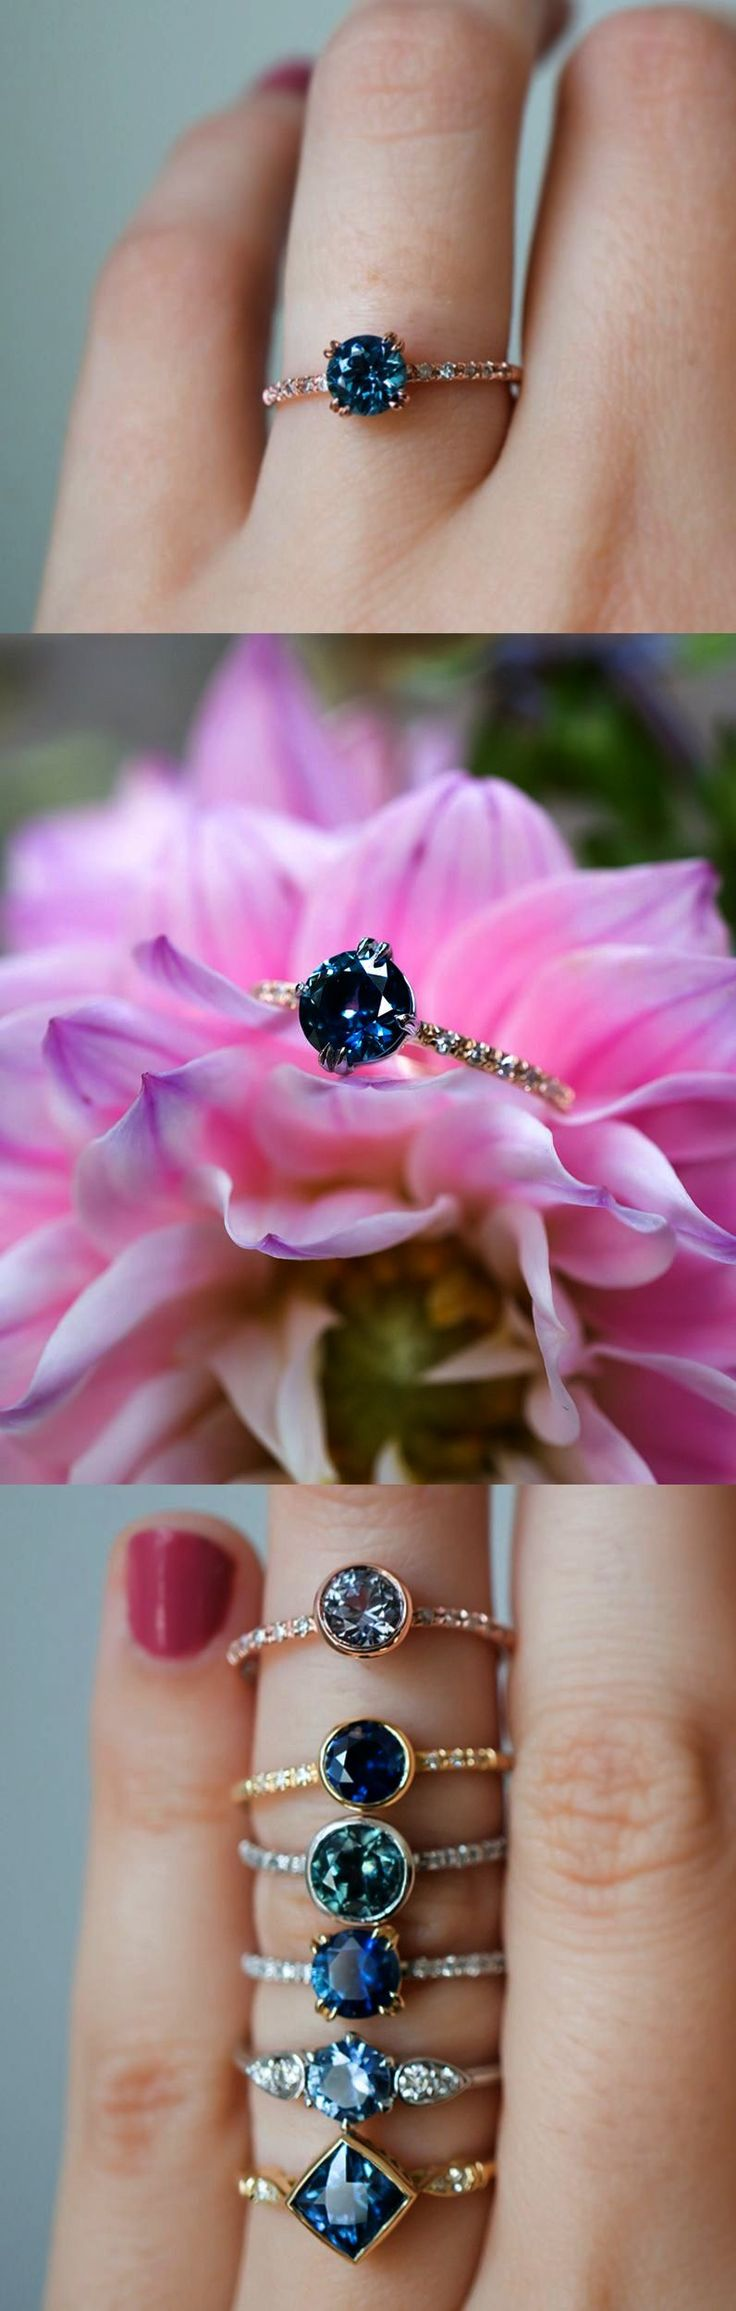 28 best Alianças images on Pinterest   Wedding bands, Engagements ...